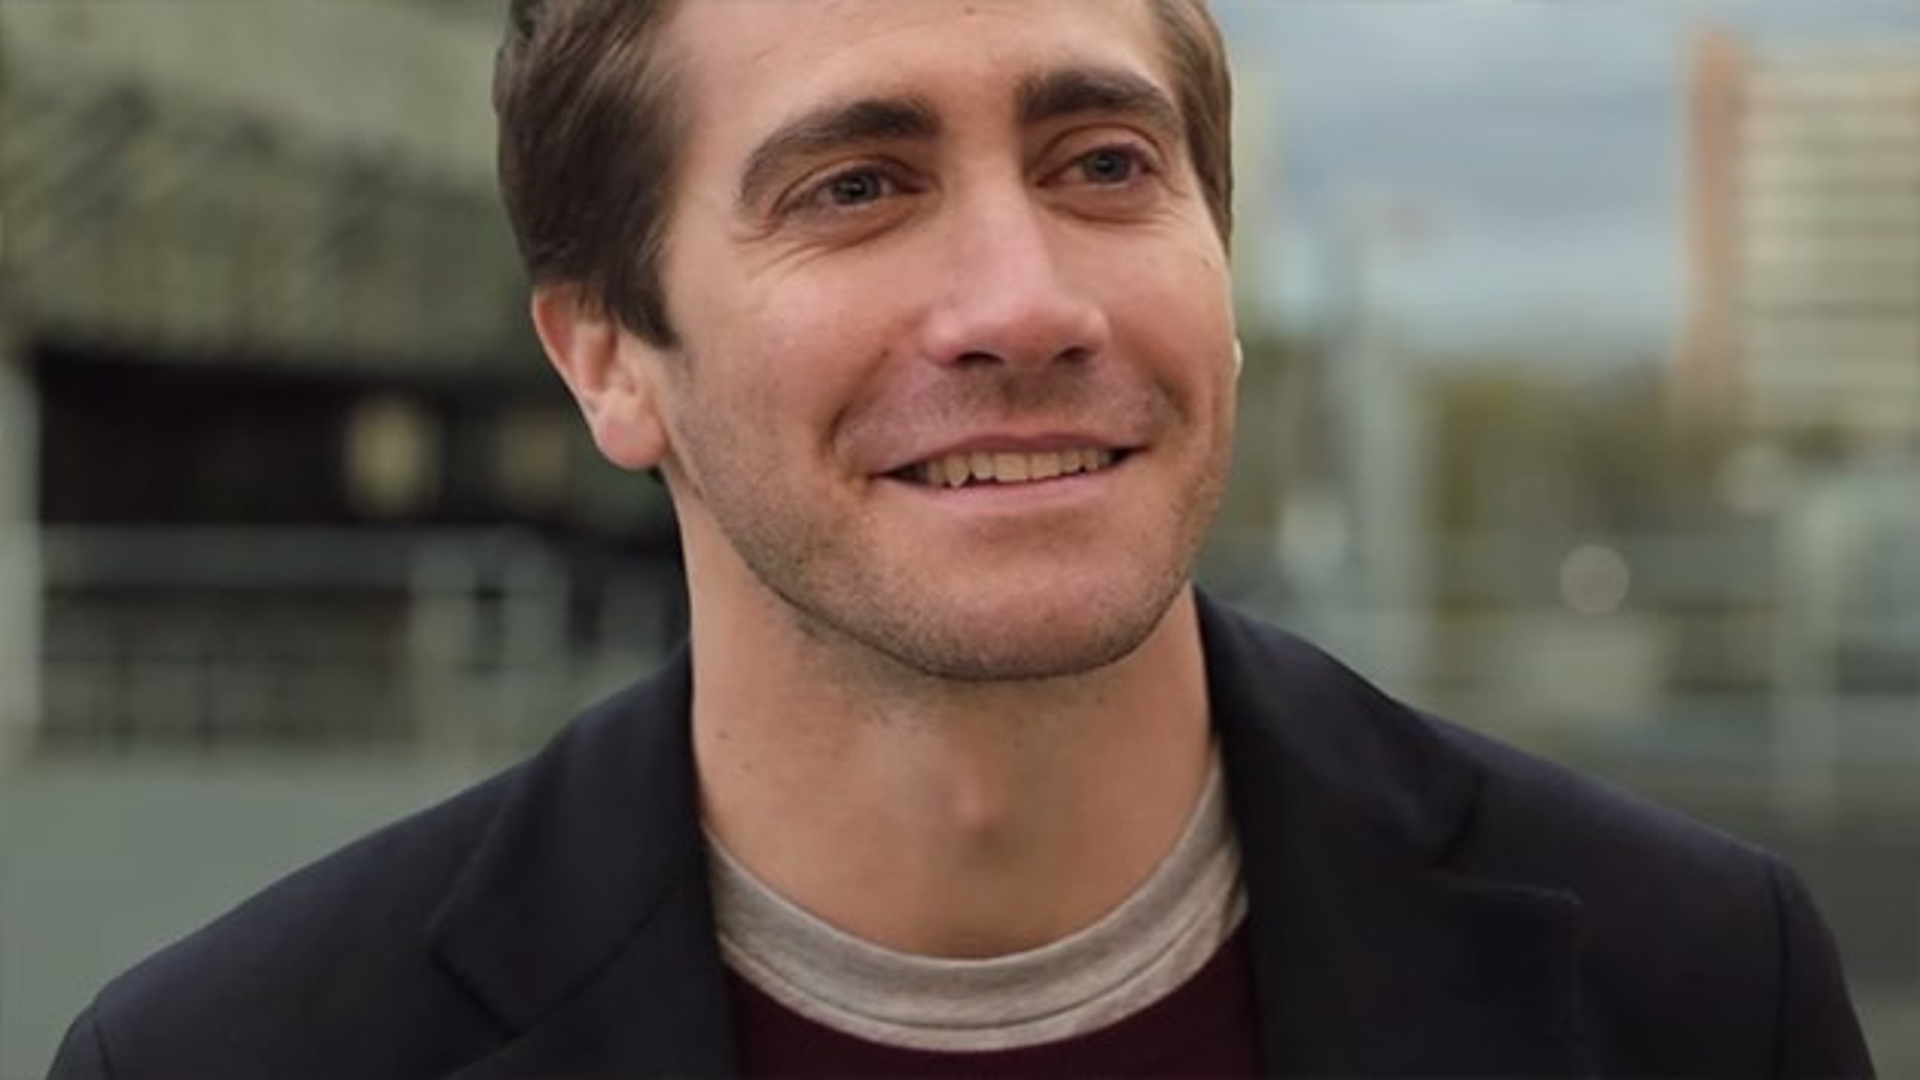 Jake-Gyllenhaal-Demolition